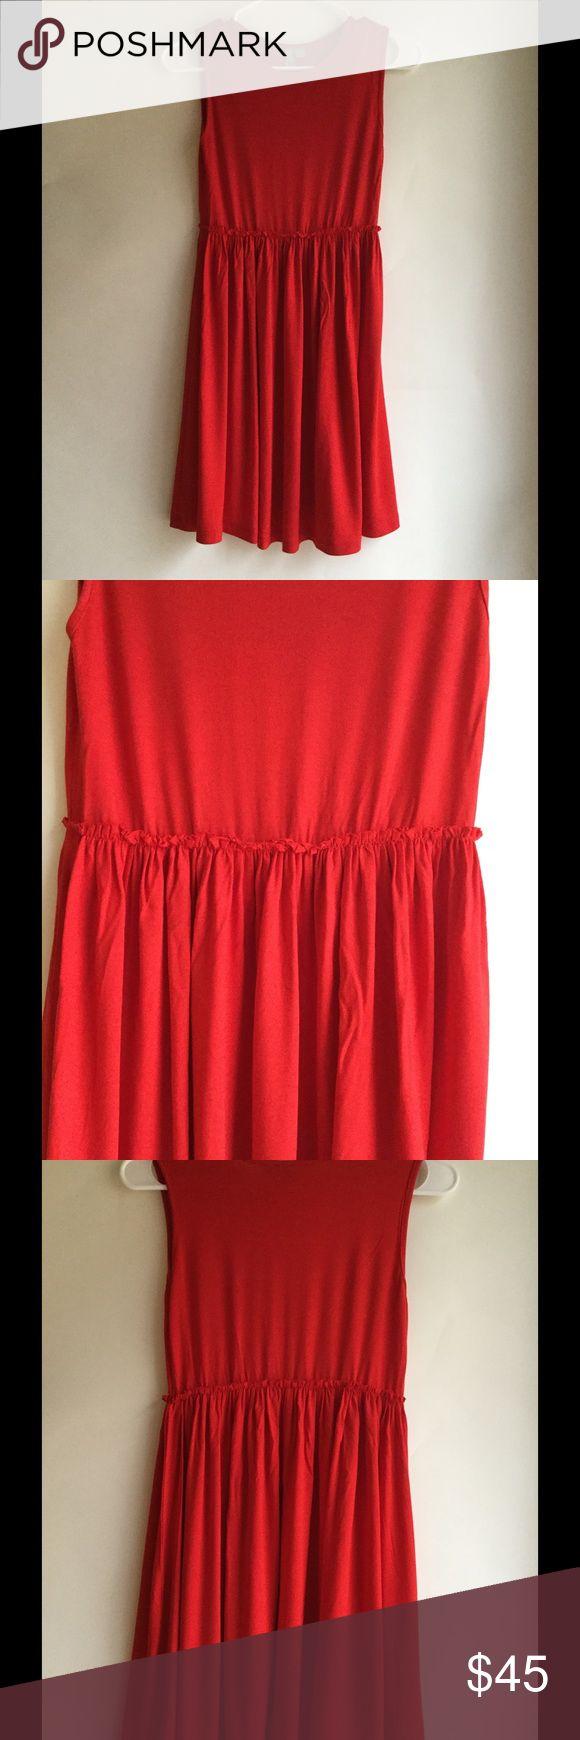 ASOS Red Dress💃 ASOS red dress❗️ super soft❗️worn once❗️ ASOS Petite Dresses Midi